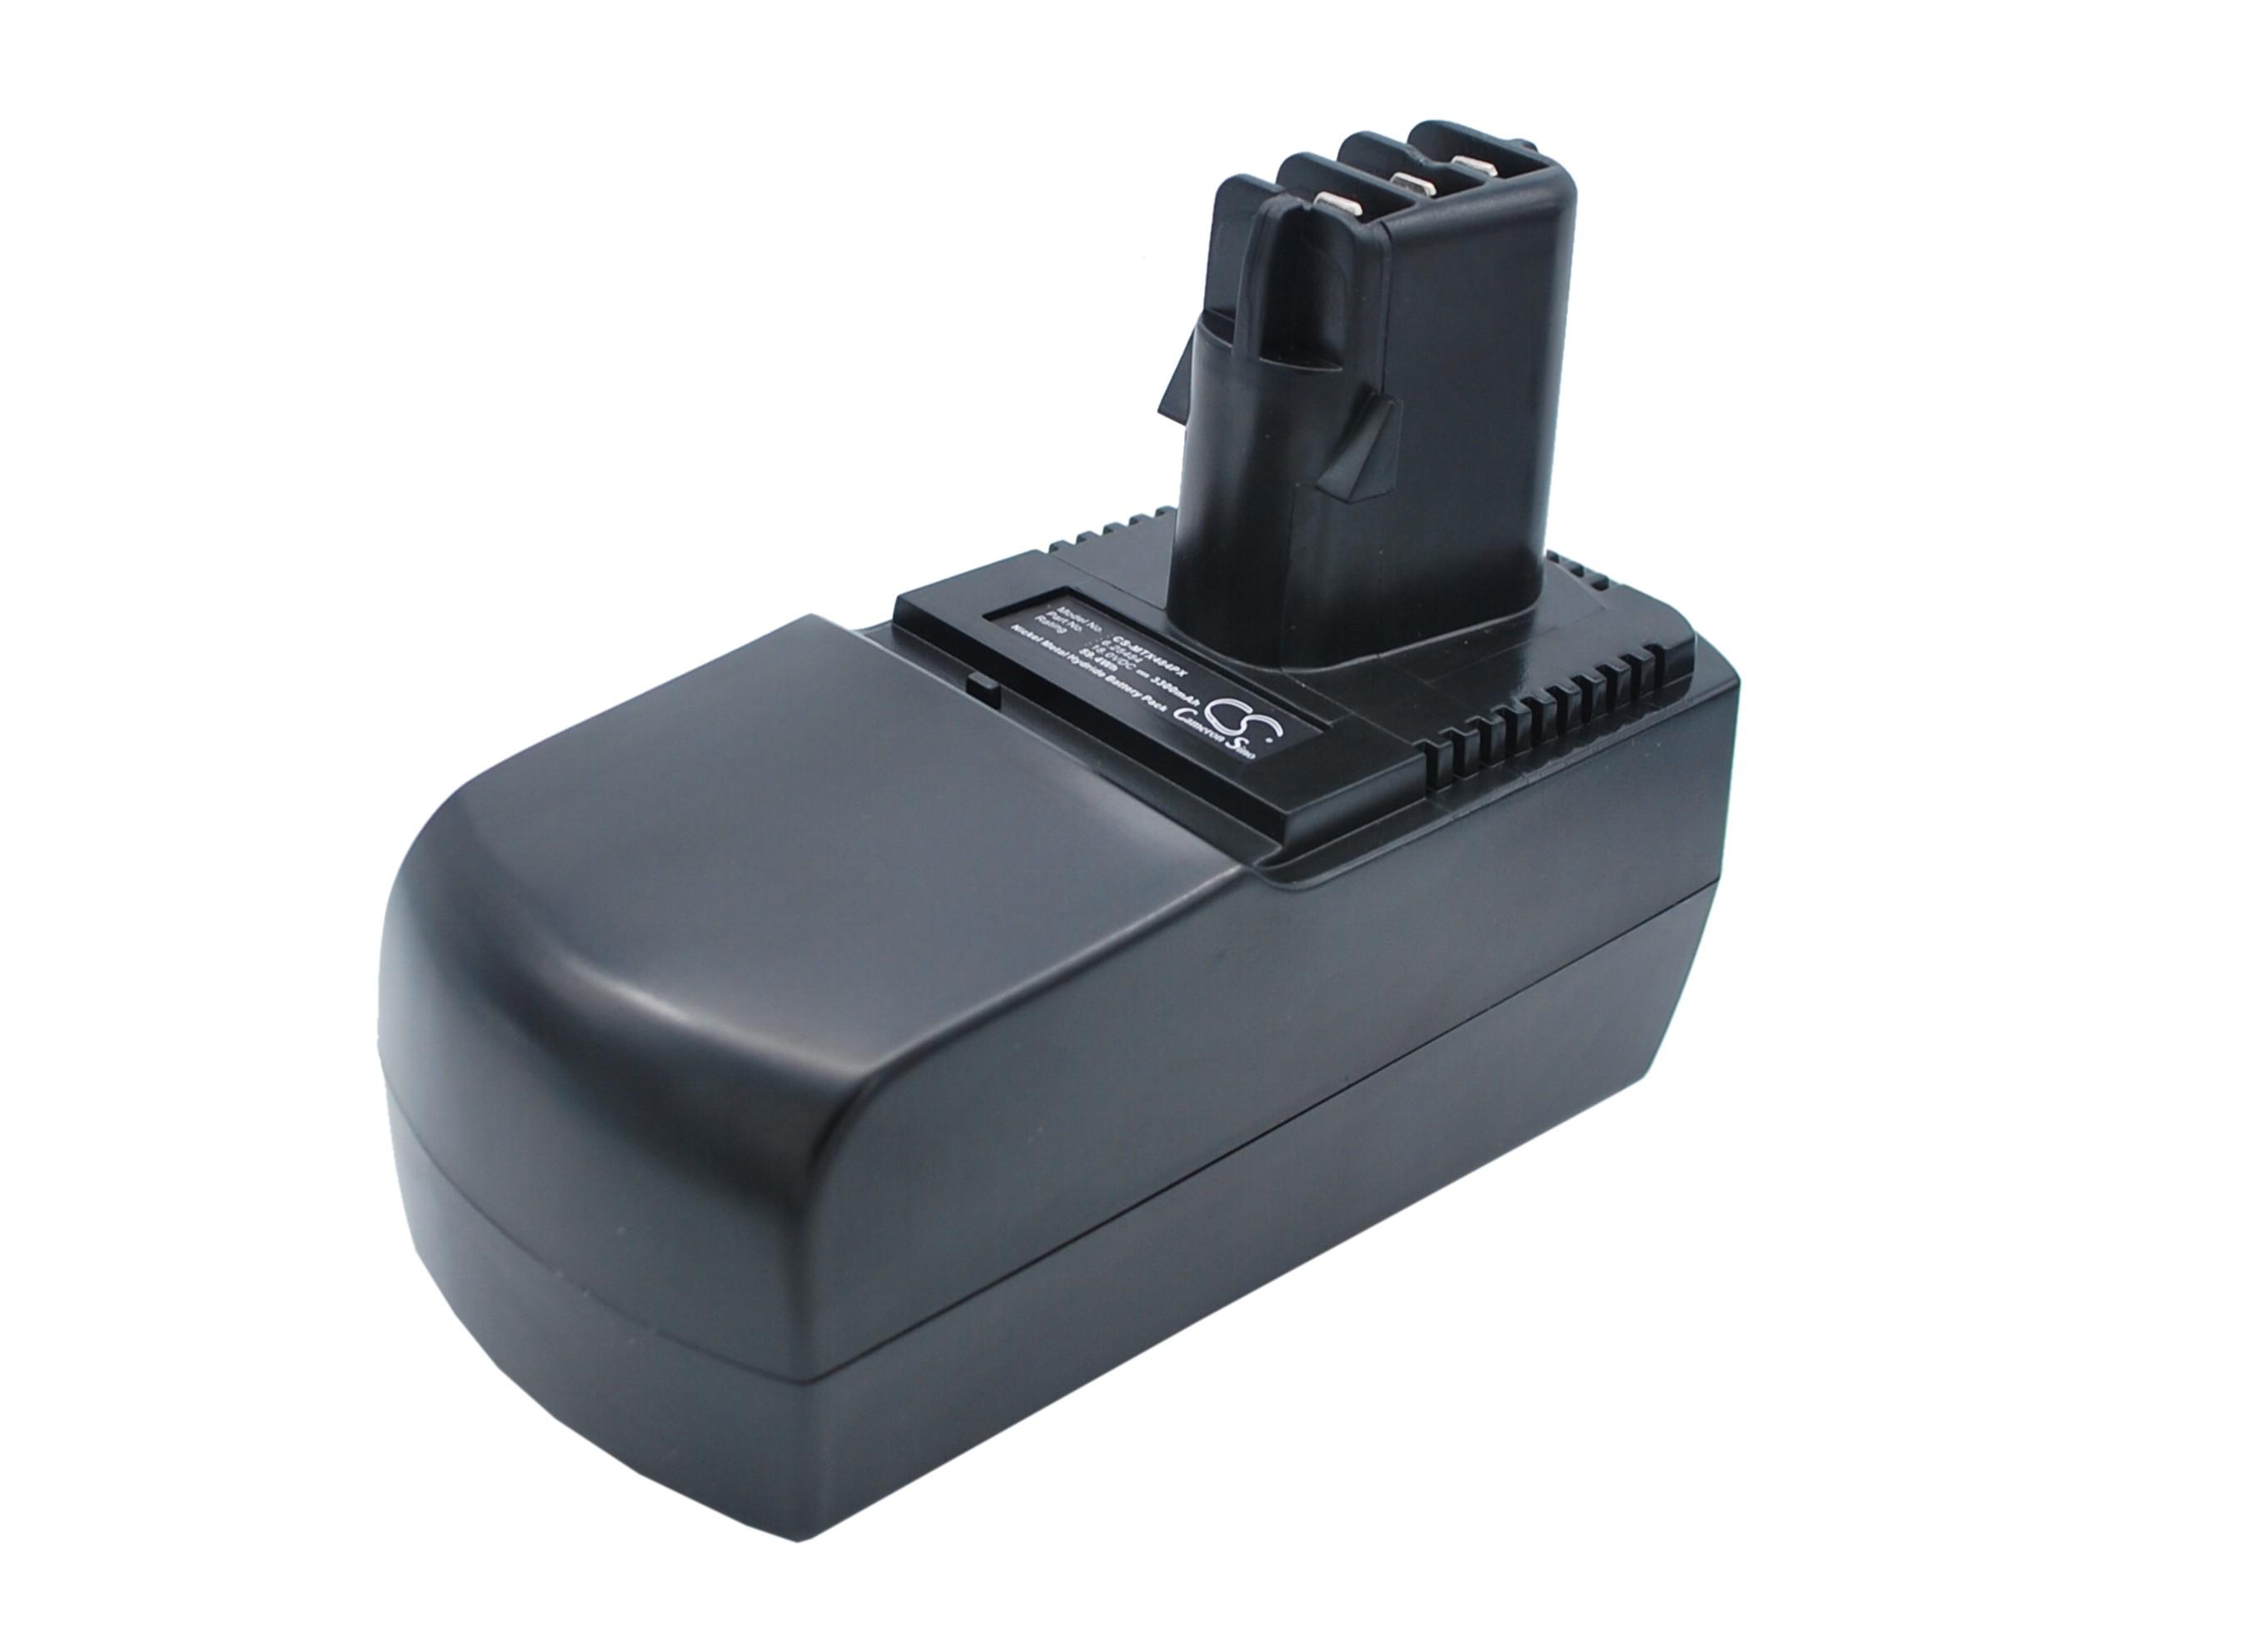 Cameron Sino baterie do nářadí pro METABO BSZ 18 Impuls Li Power 18V Ni-MH 3300mAh černá - neoriginální